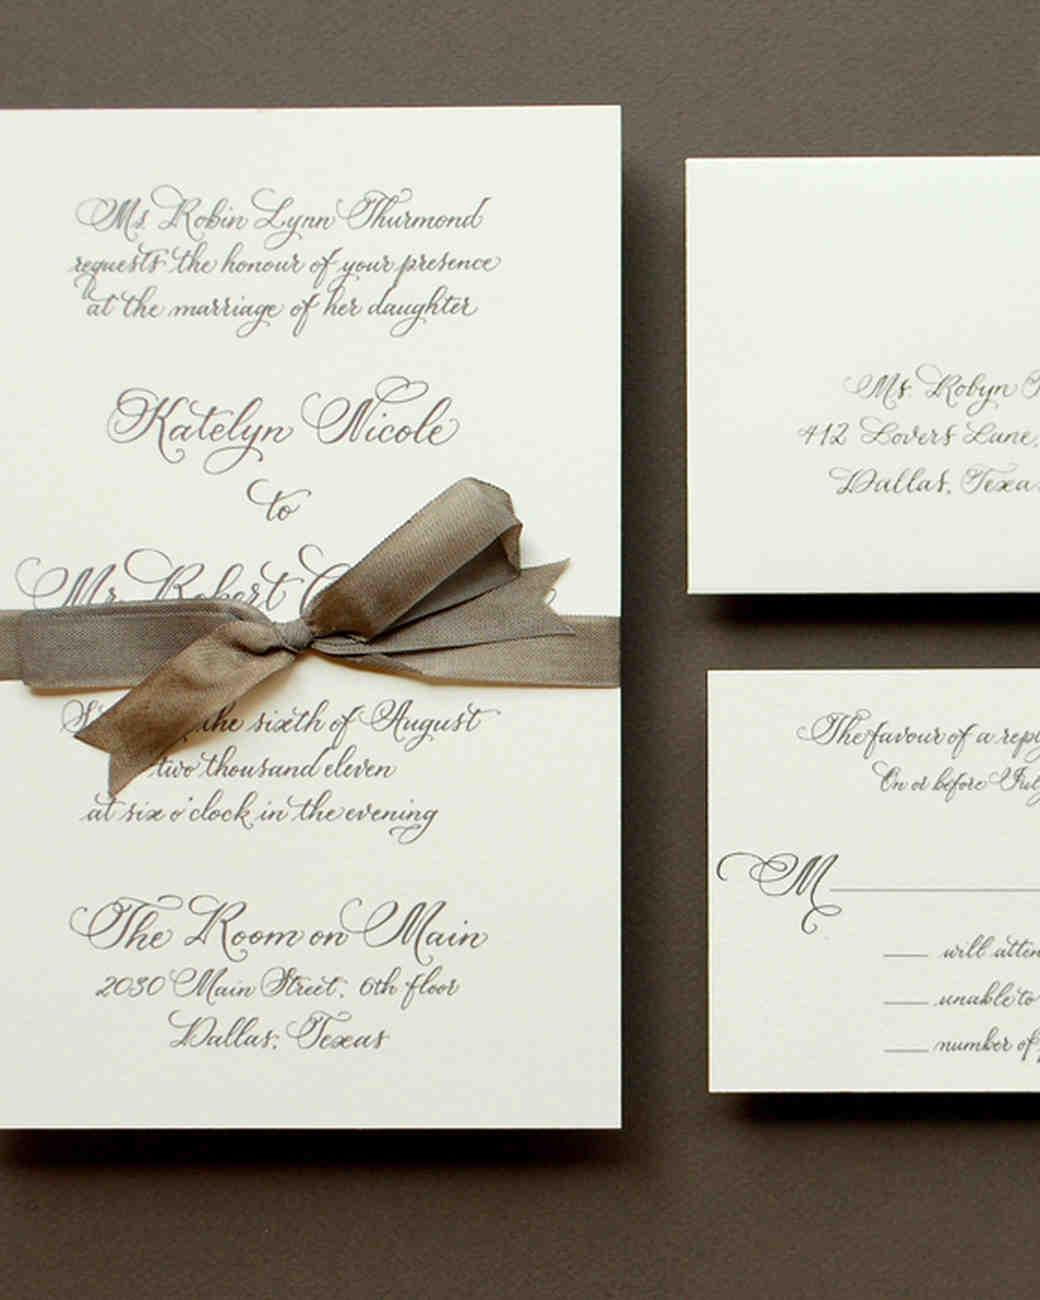 Your Wedding Guest List Etiquette Questions Answered   Martha Stewart  Weddings